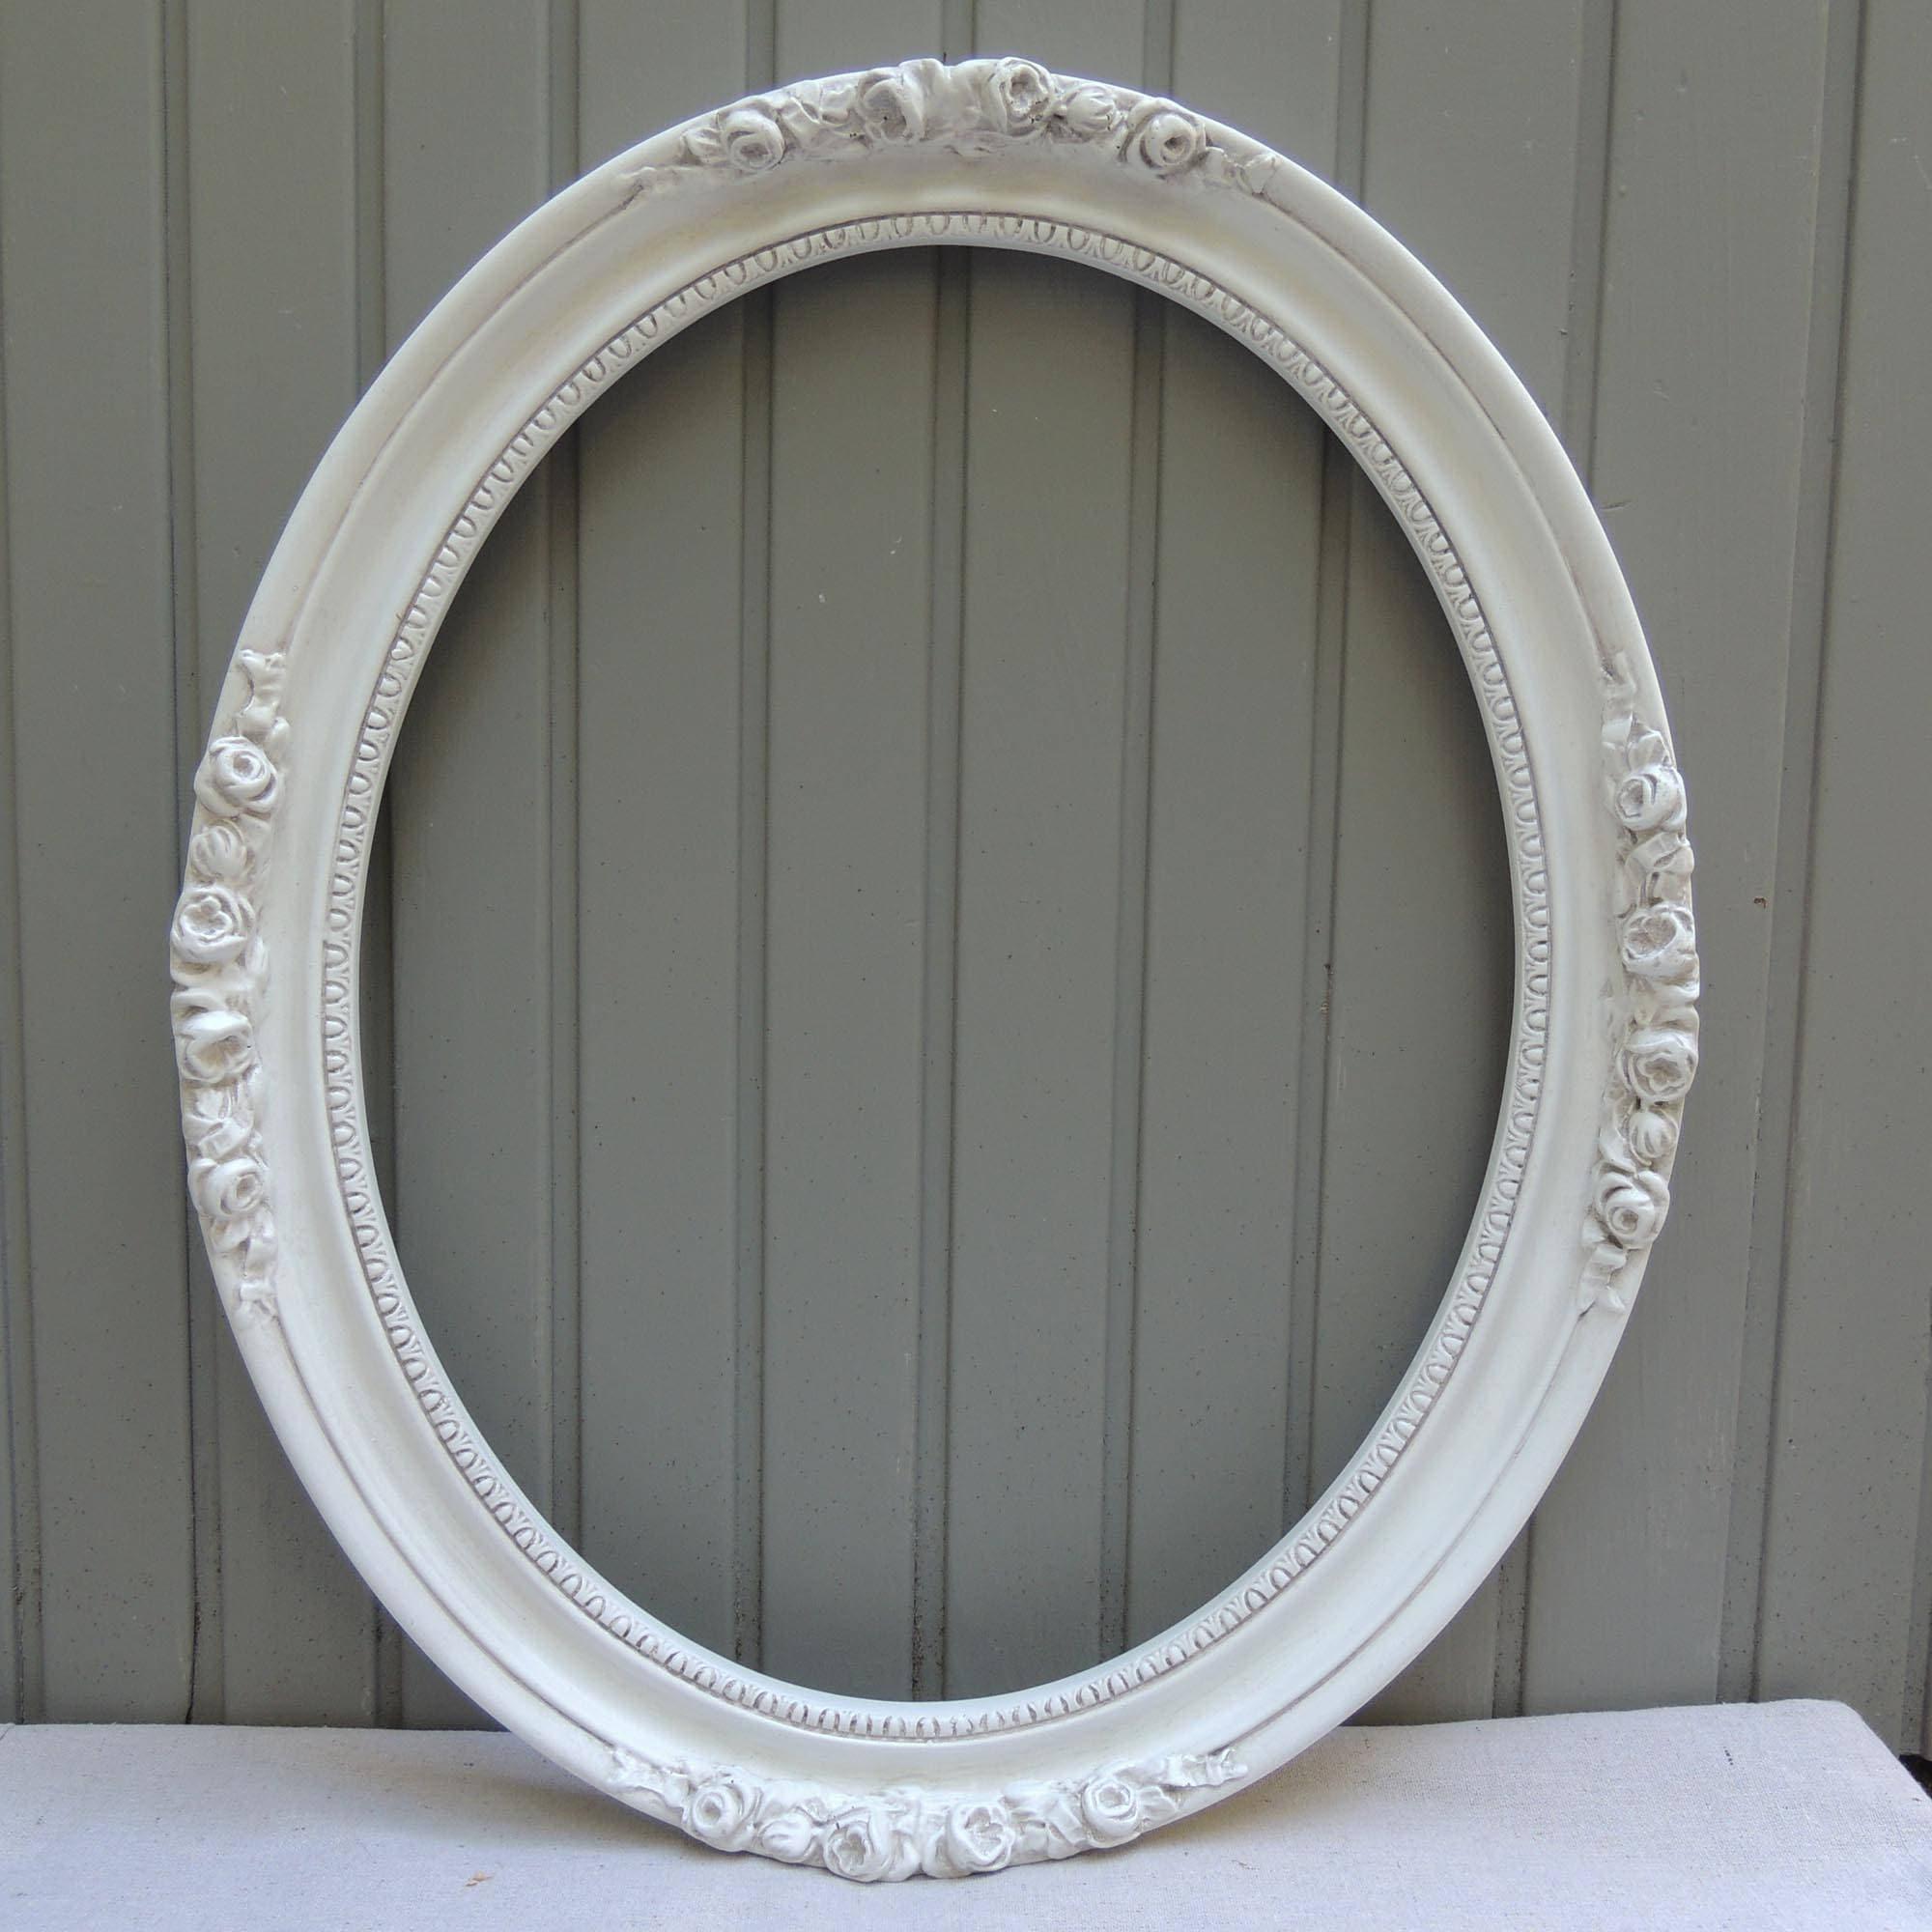 16 x 20 Oval Blanco marco Vintage ovalada, grande Oval marco para ...